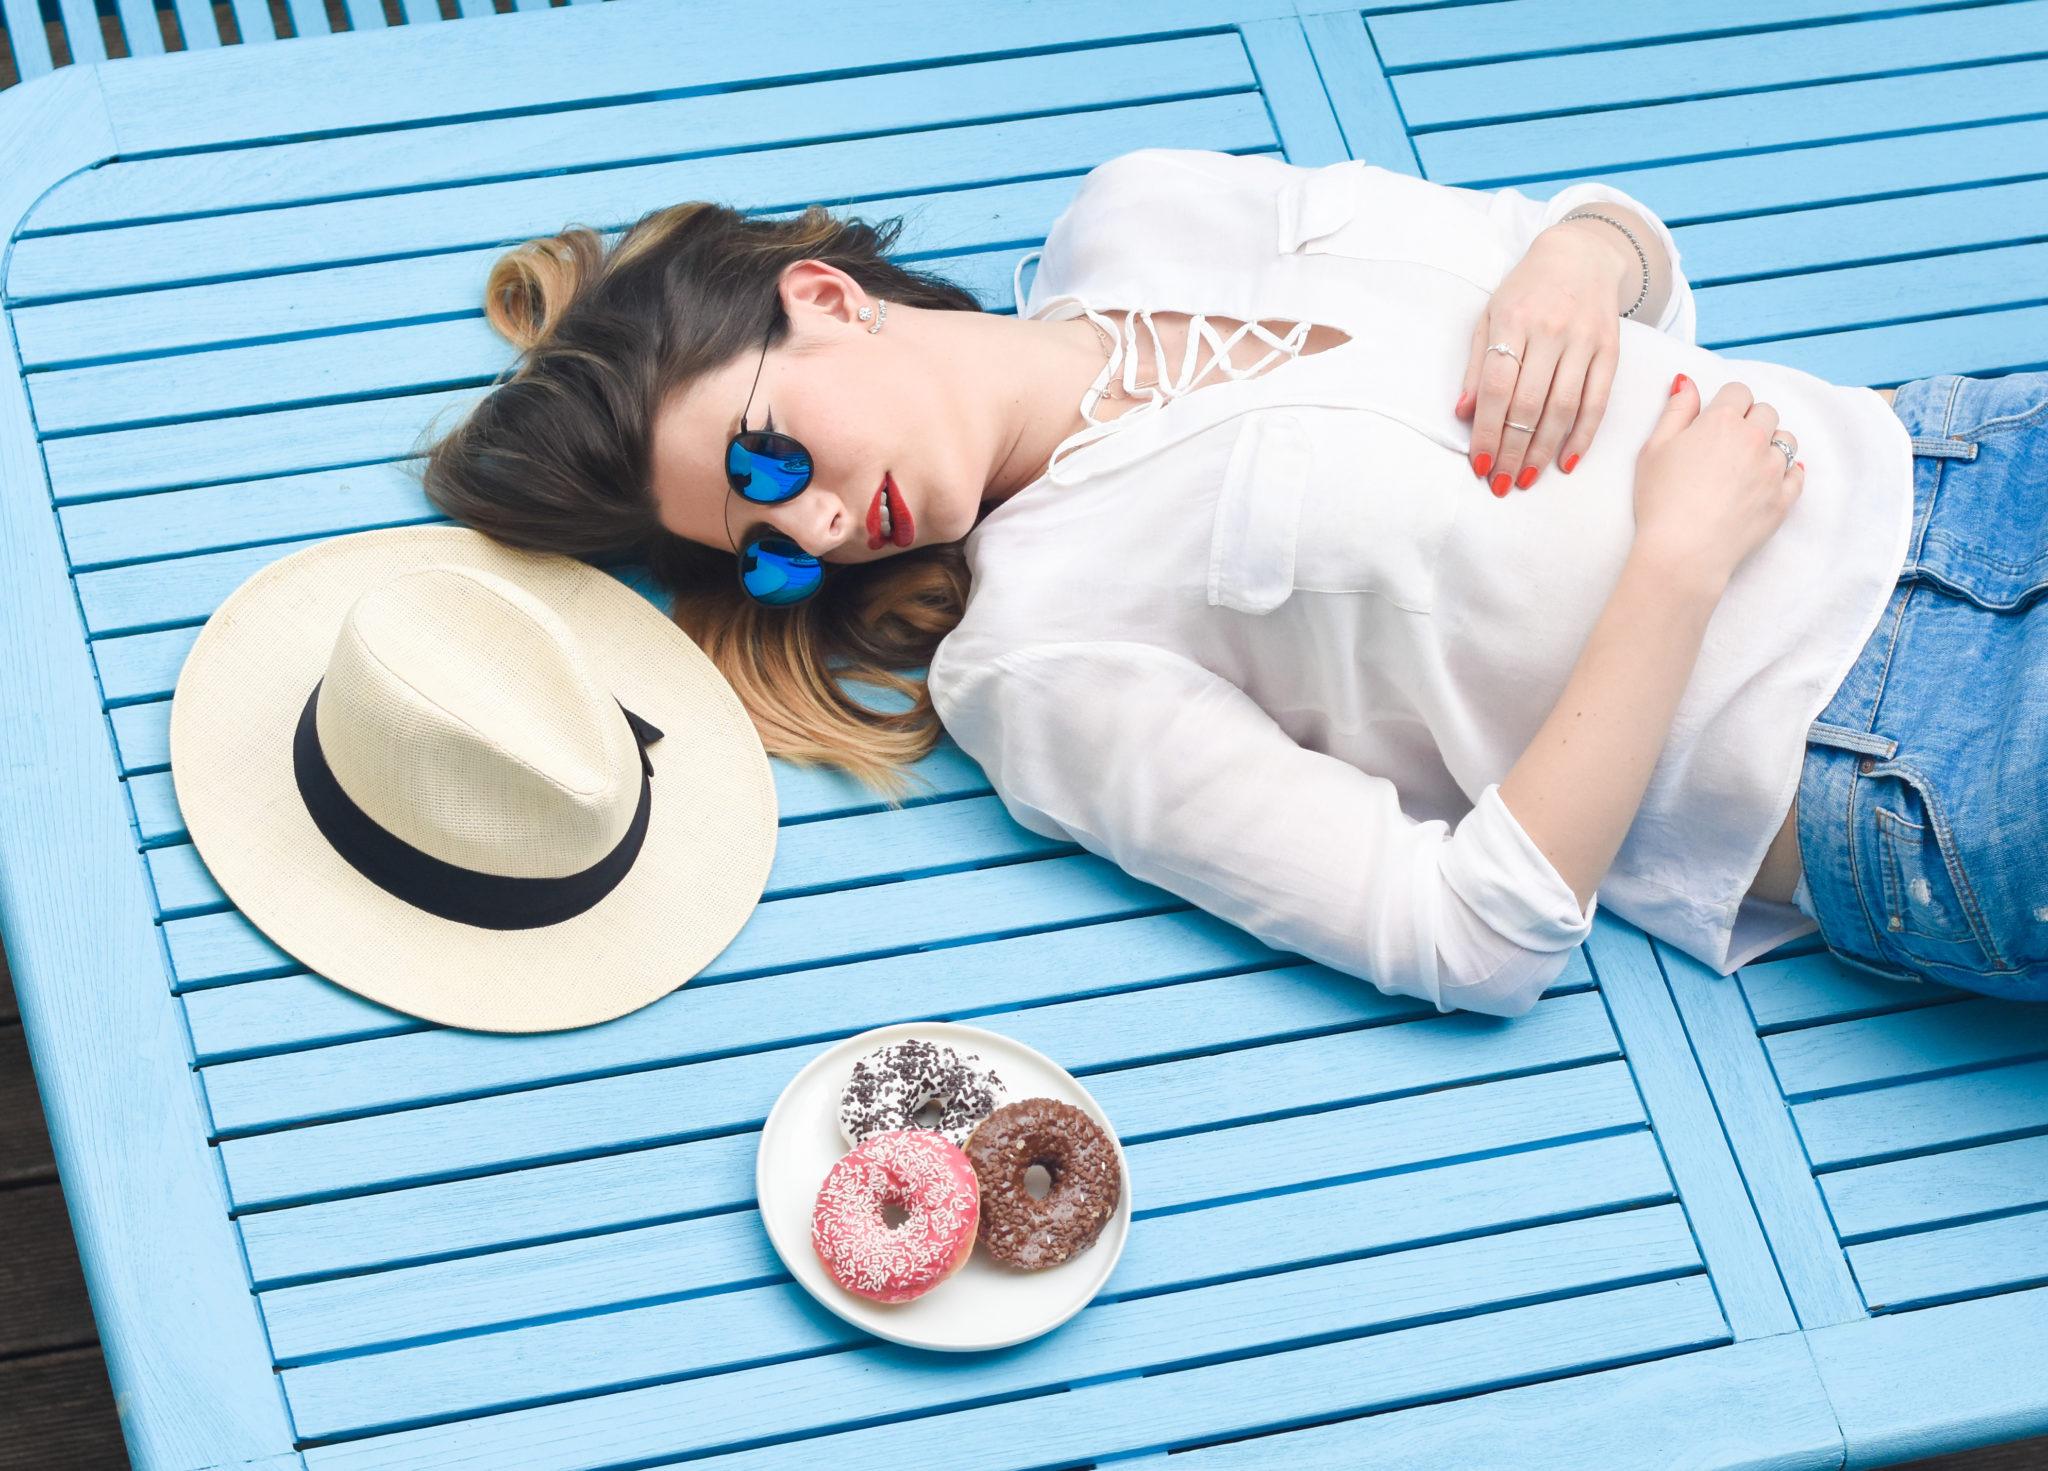 giulia de martin spektre sunglasses eyewear behindmyglasses.com mirror lenses metro 2 flat met-ro sunnies -27